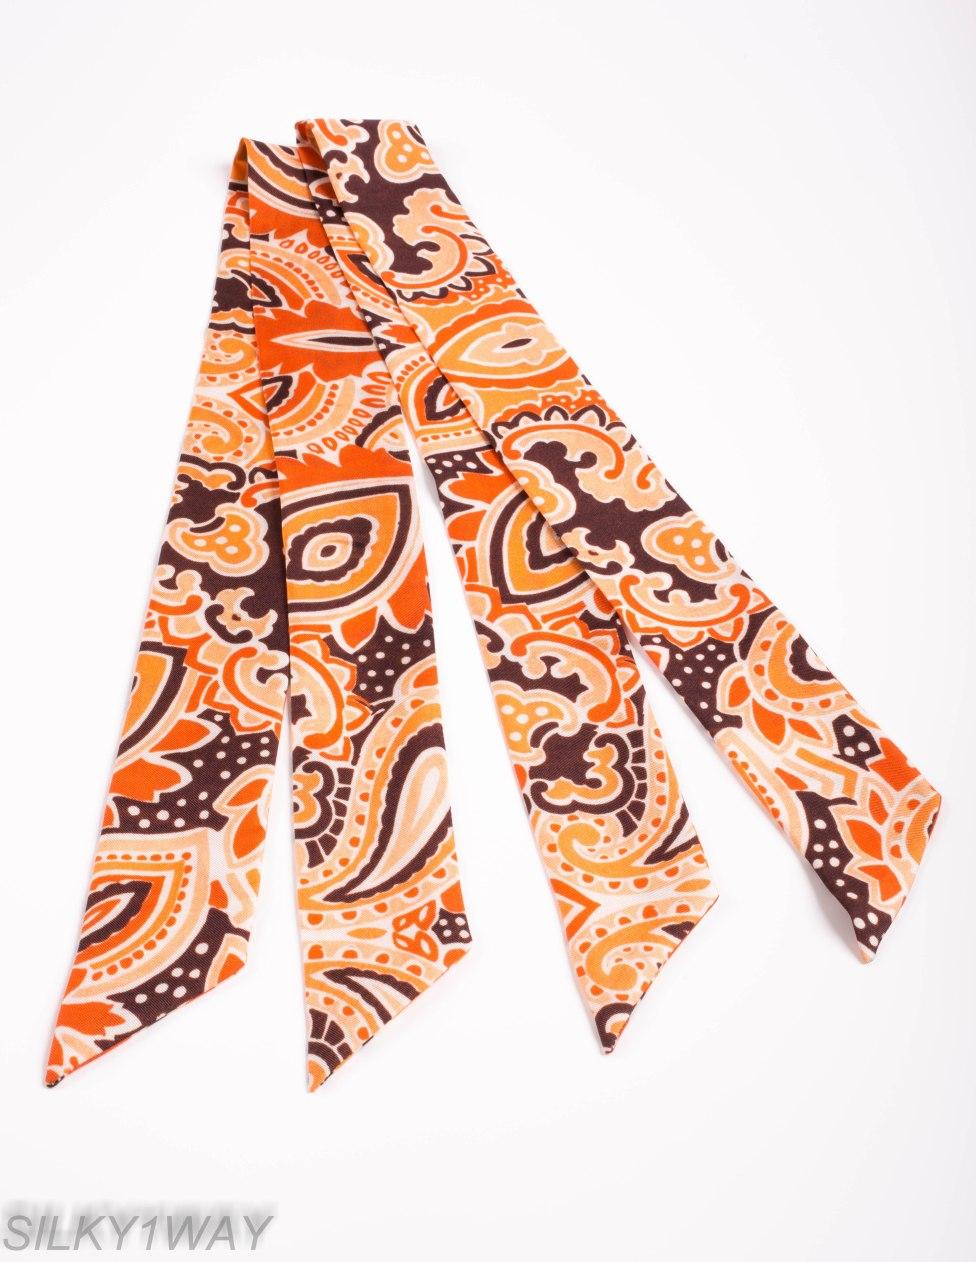 Orange Twilly/Ribbon scarf